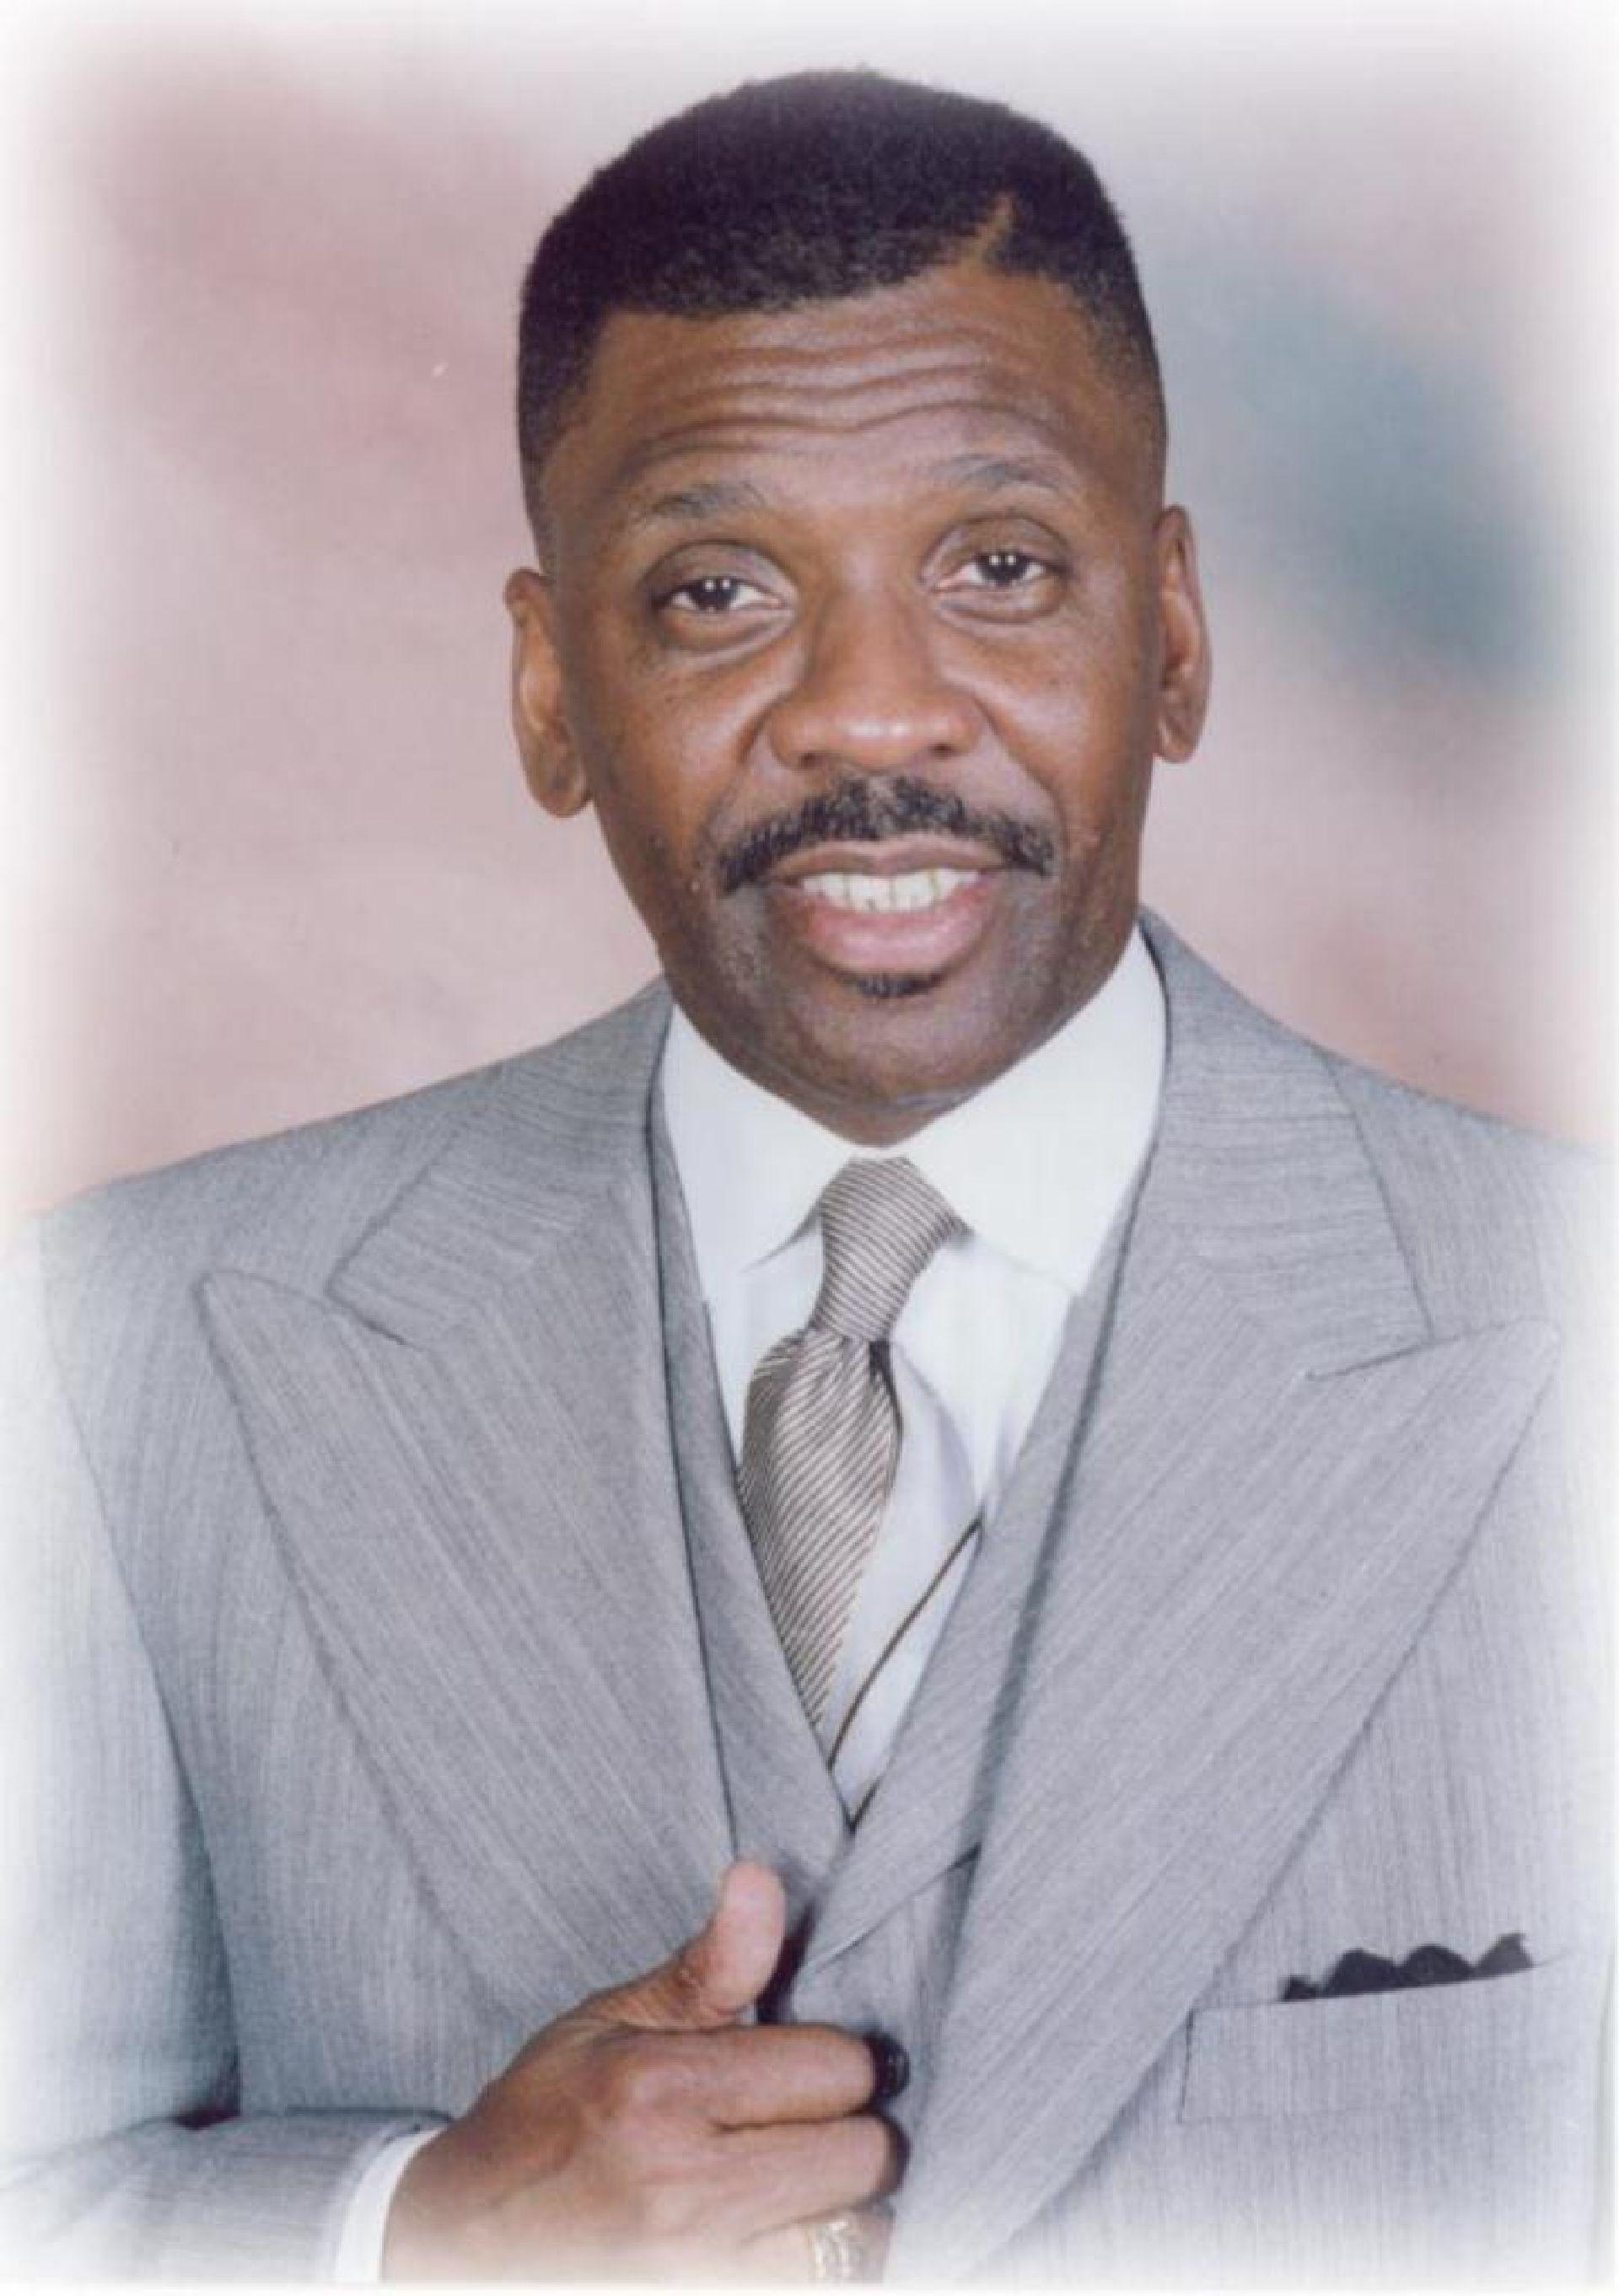 Superintendent Michael Eaddy